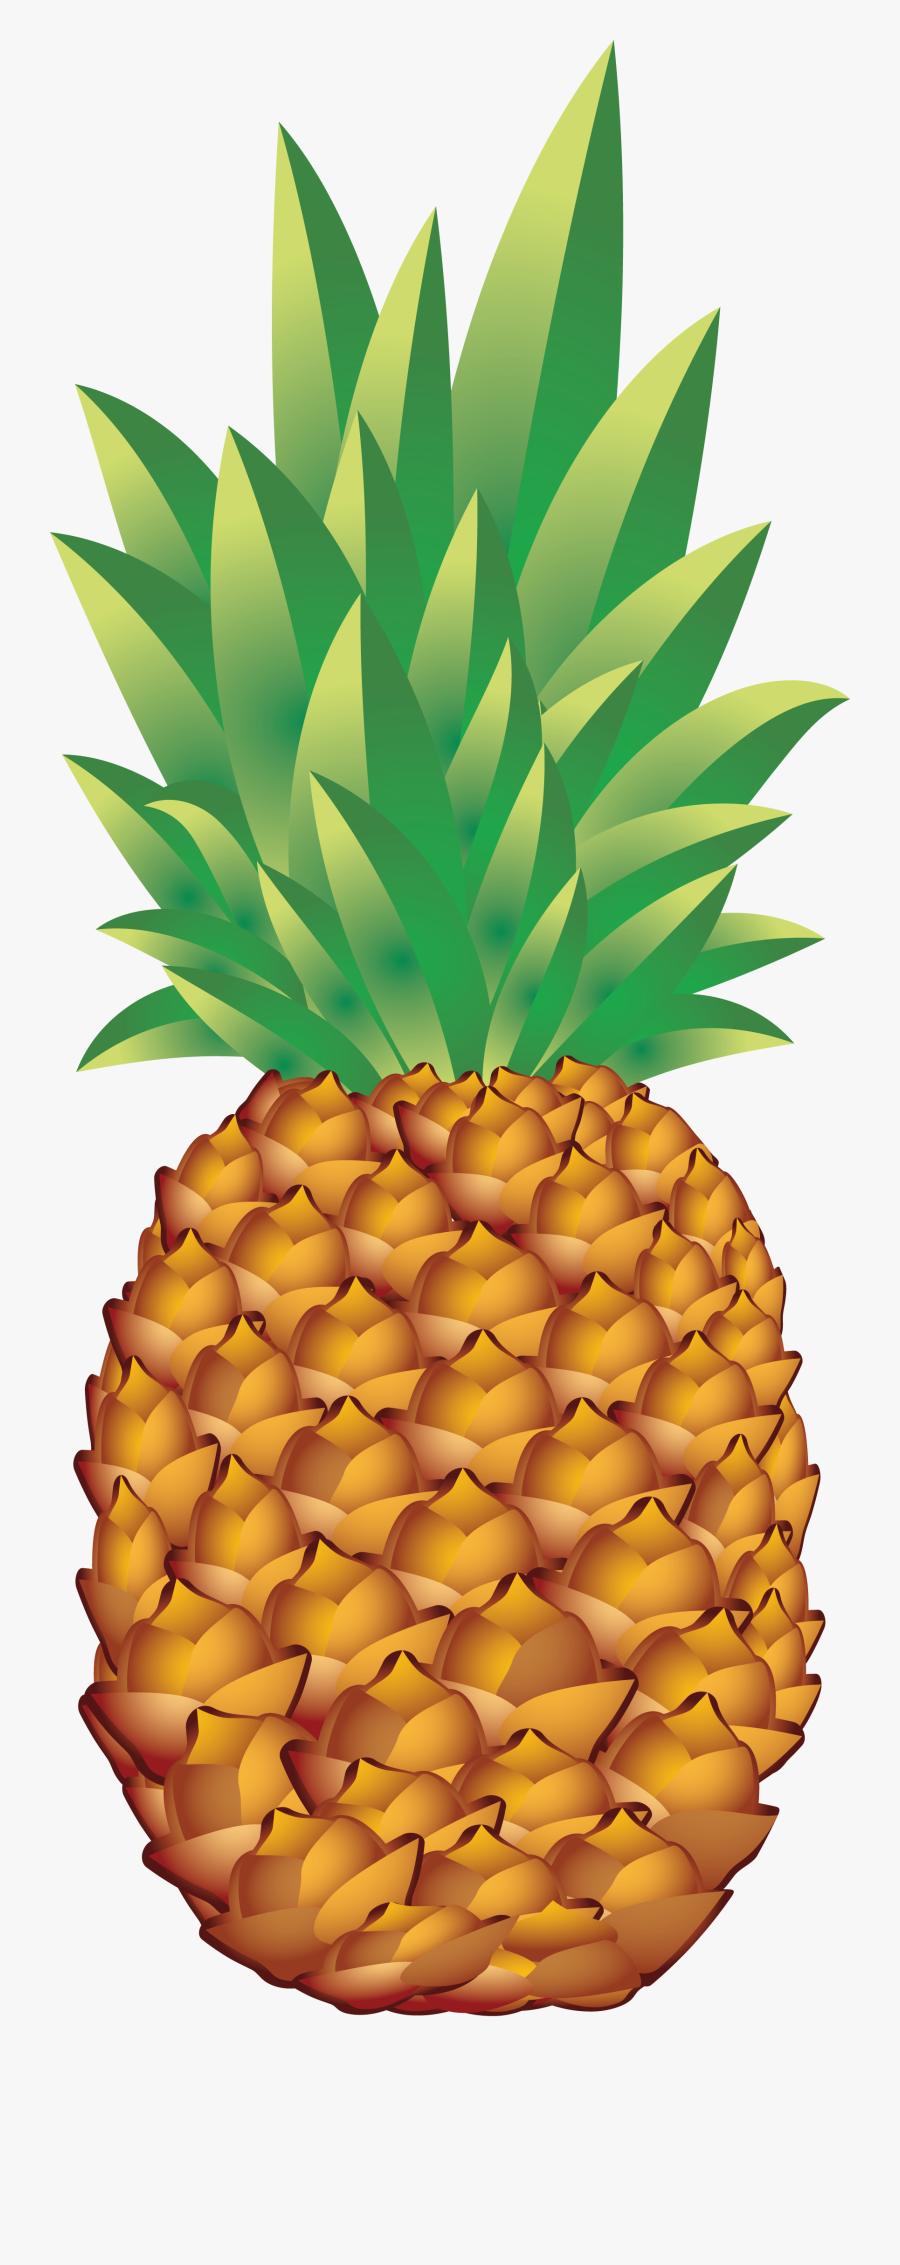 Pineapple Clipart Transparent Background, Transparent Clipart